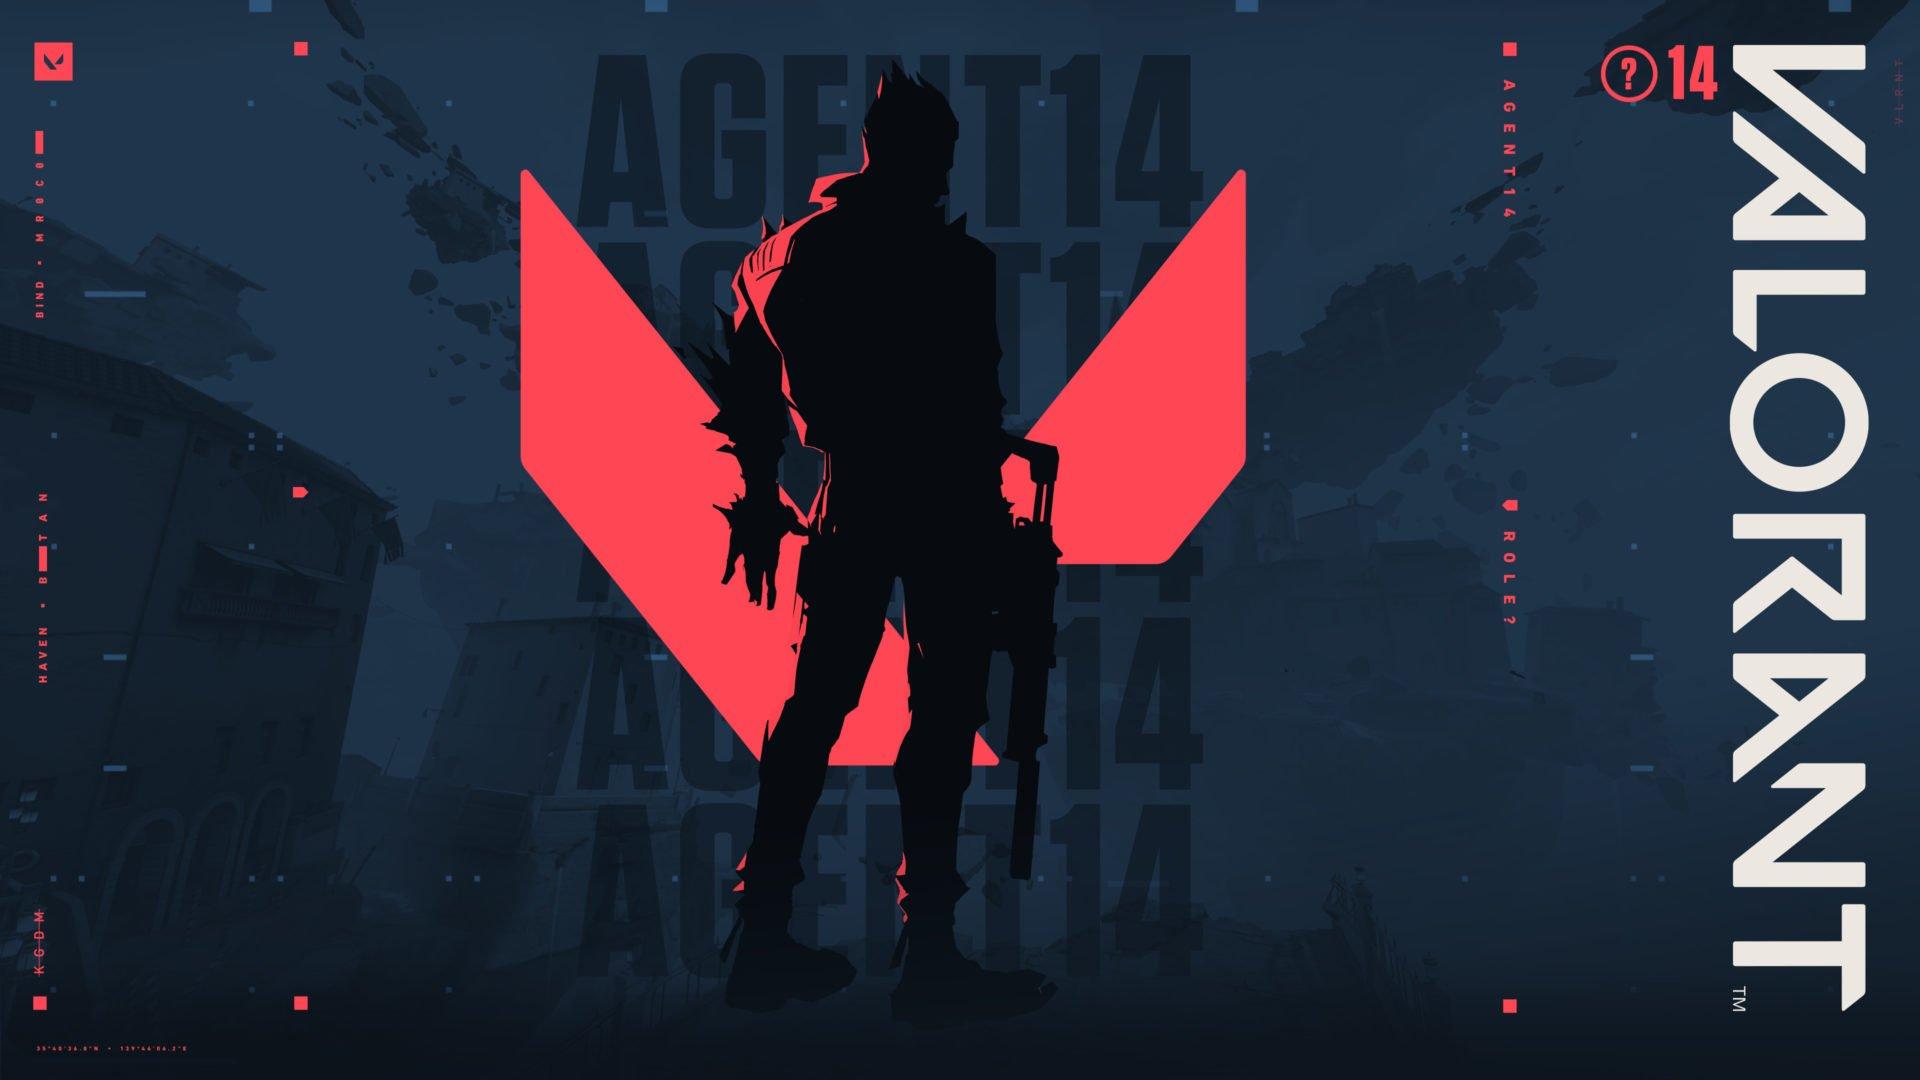 VALORANT's upcoming Agent 14